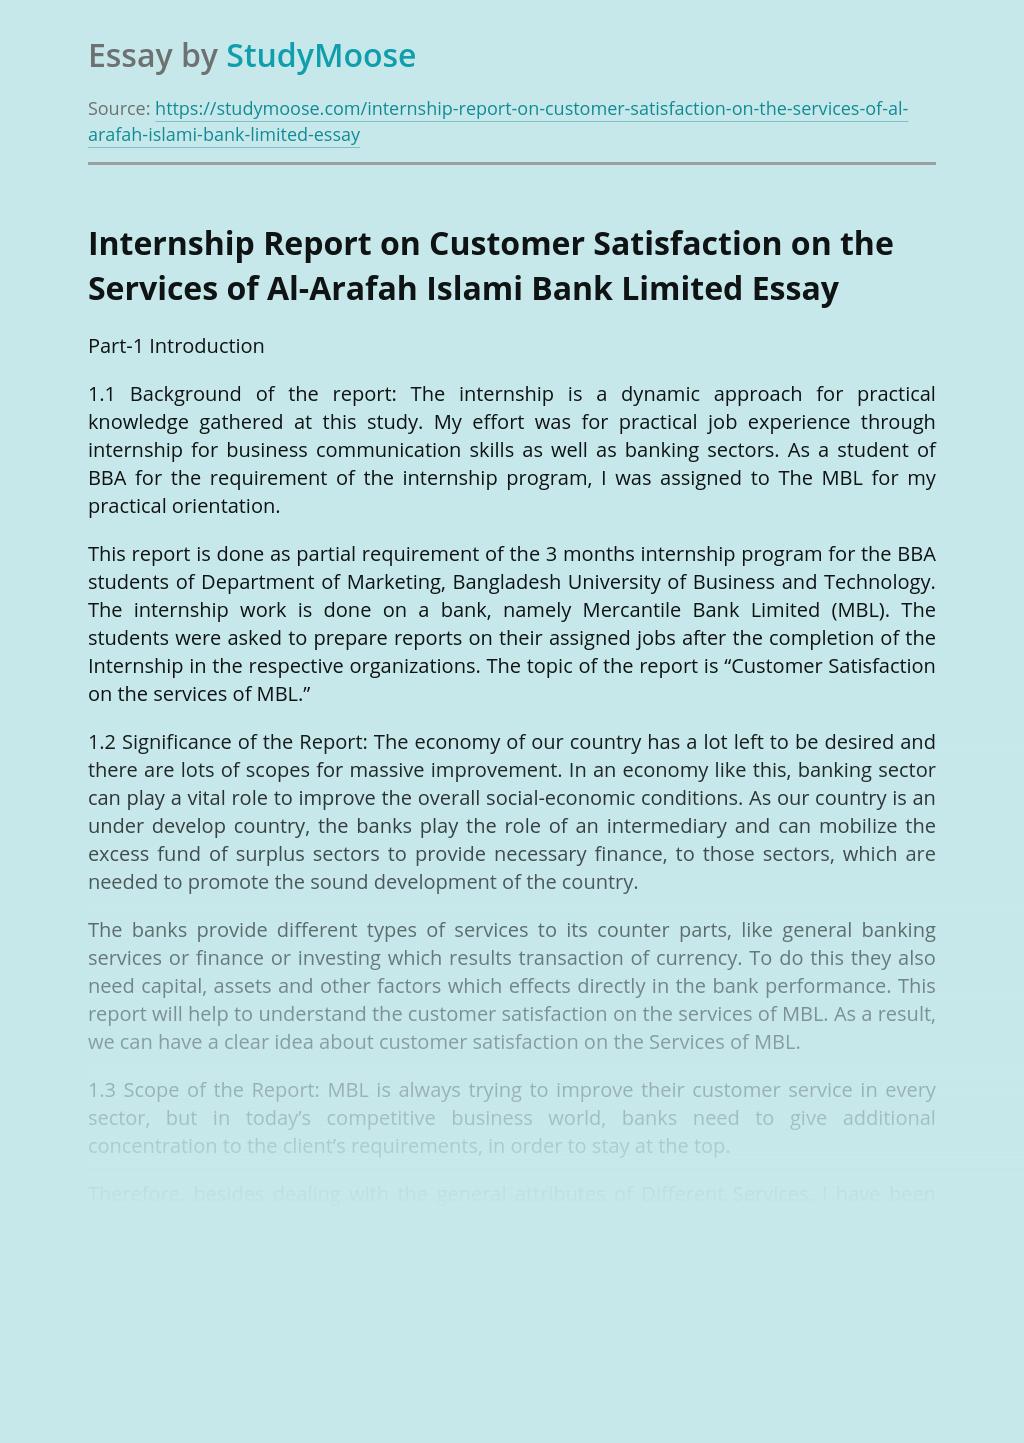 Internship Report on Customer Satisfaction on the Services of Al-Arafah Islami Bank Limited